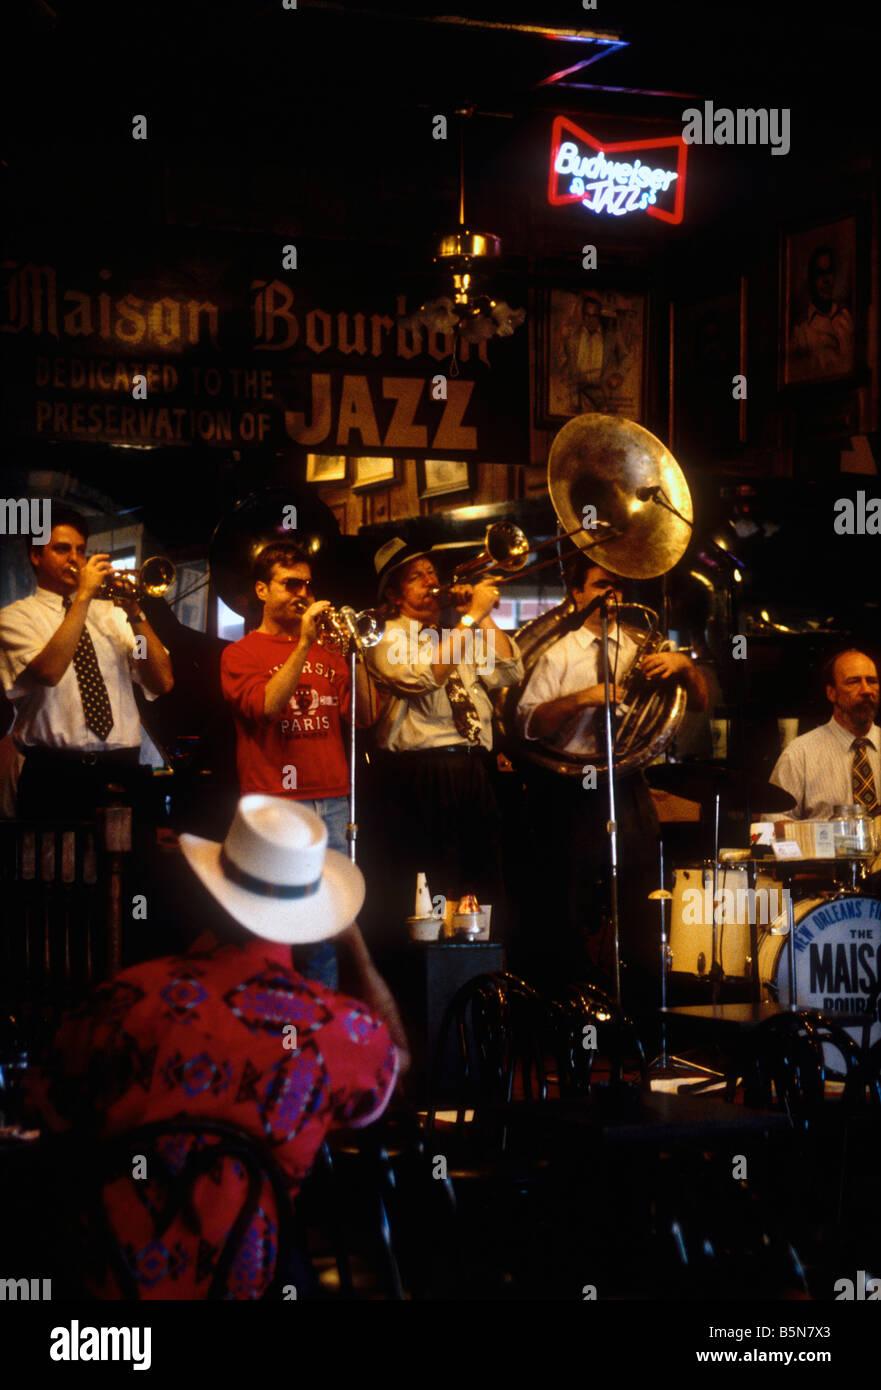 Traditional Jazz band in Mason Bourbon bar Bourbon street New Orleans USA - Stock Image